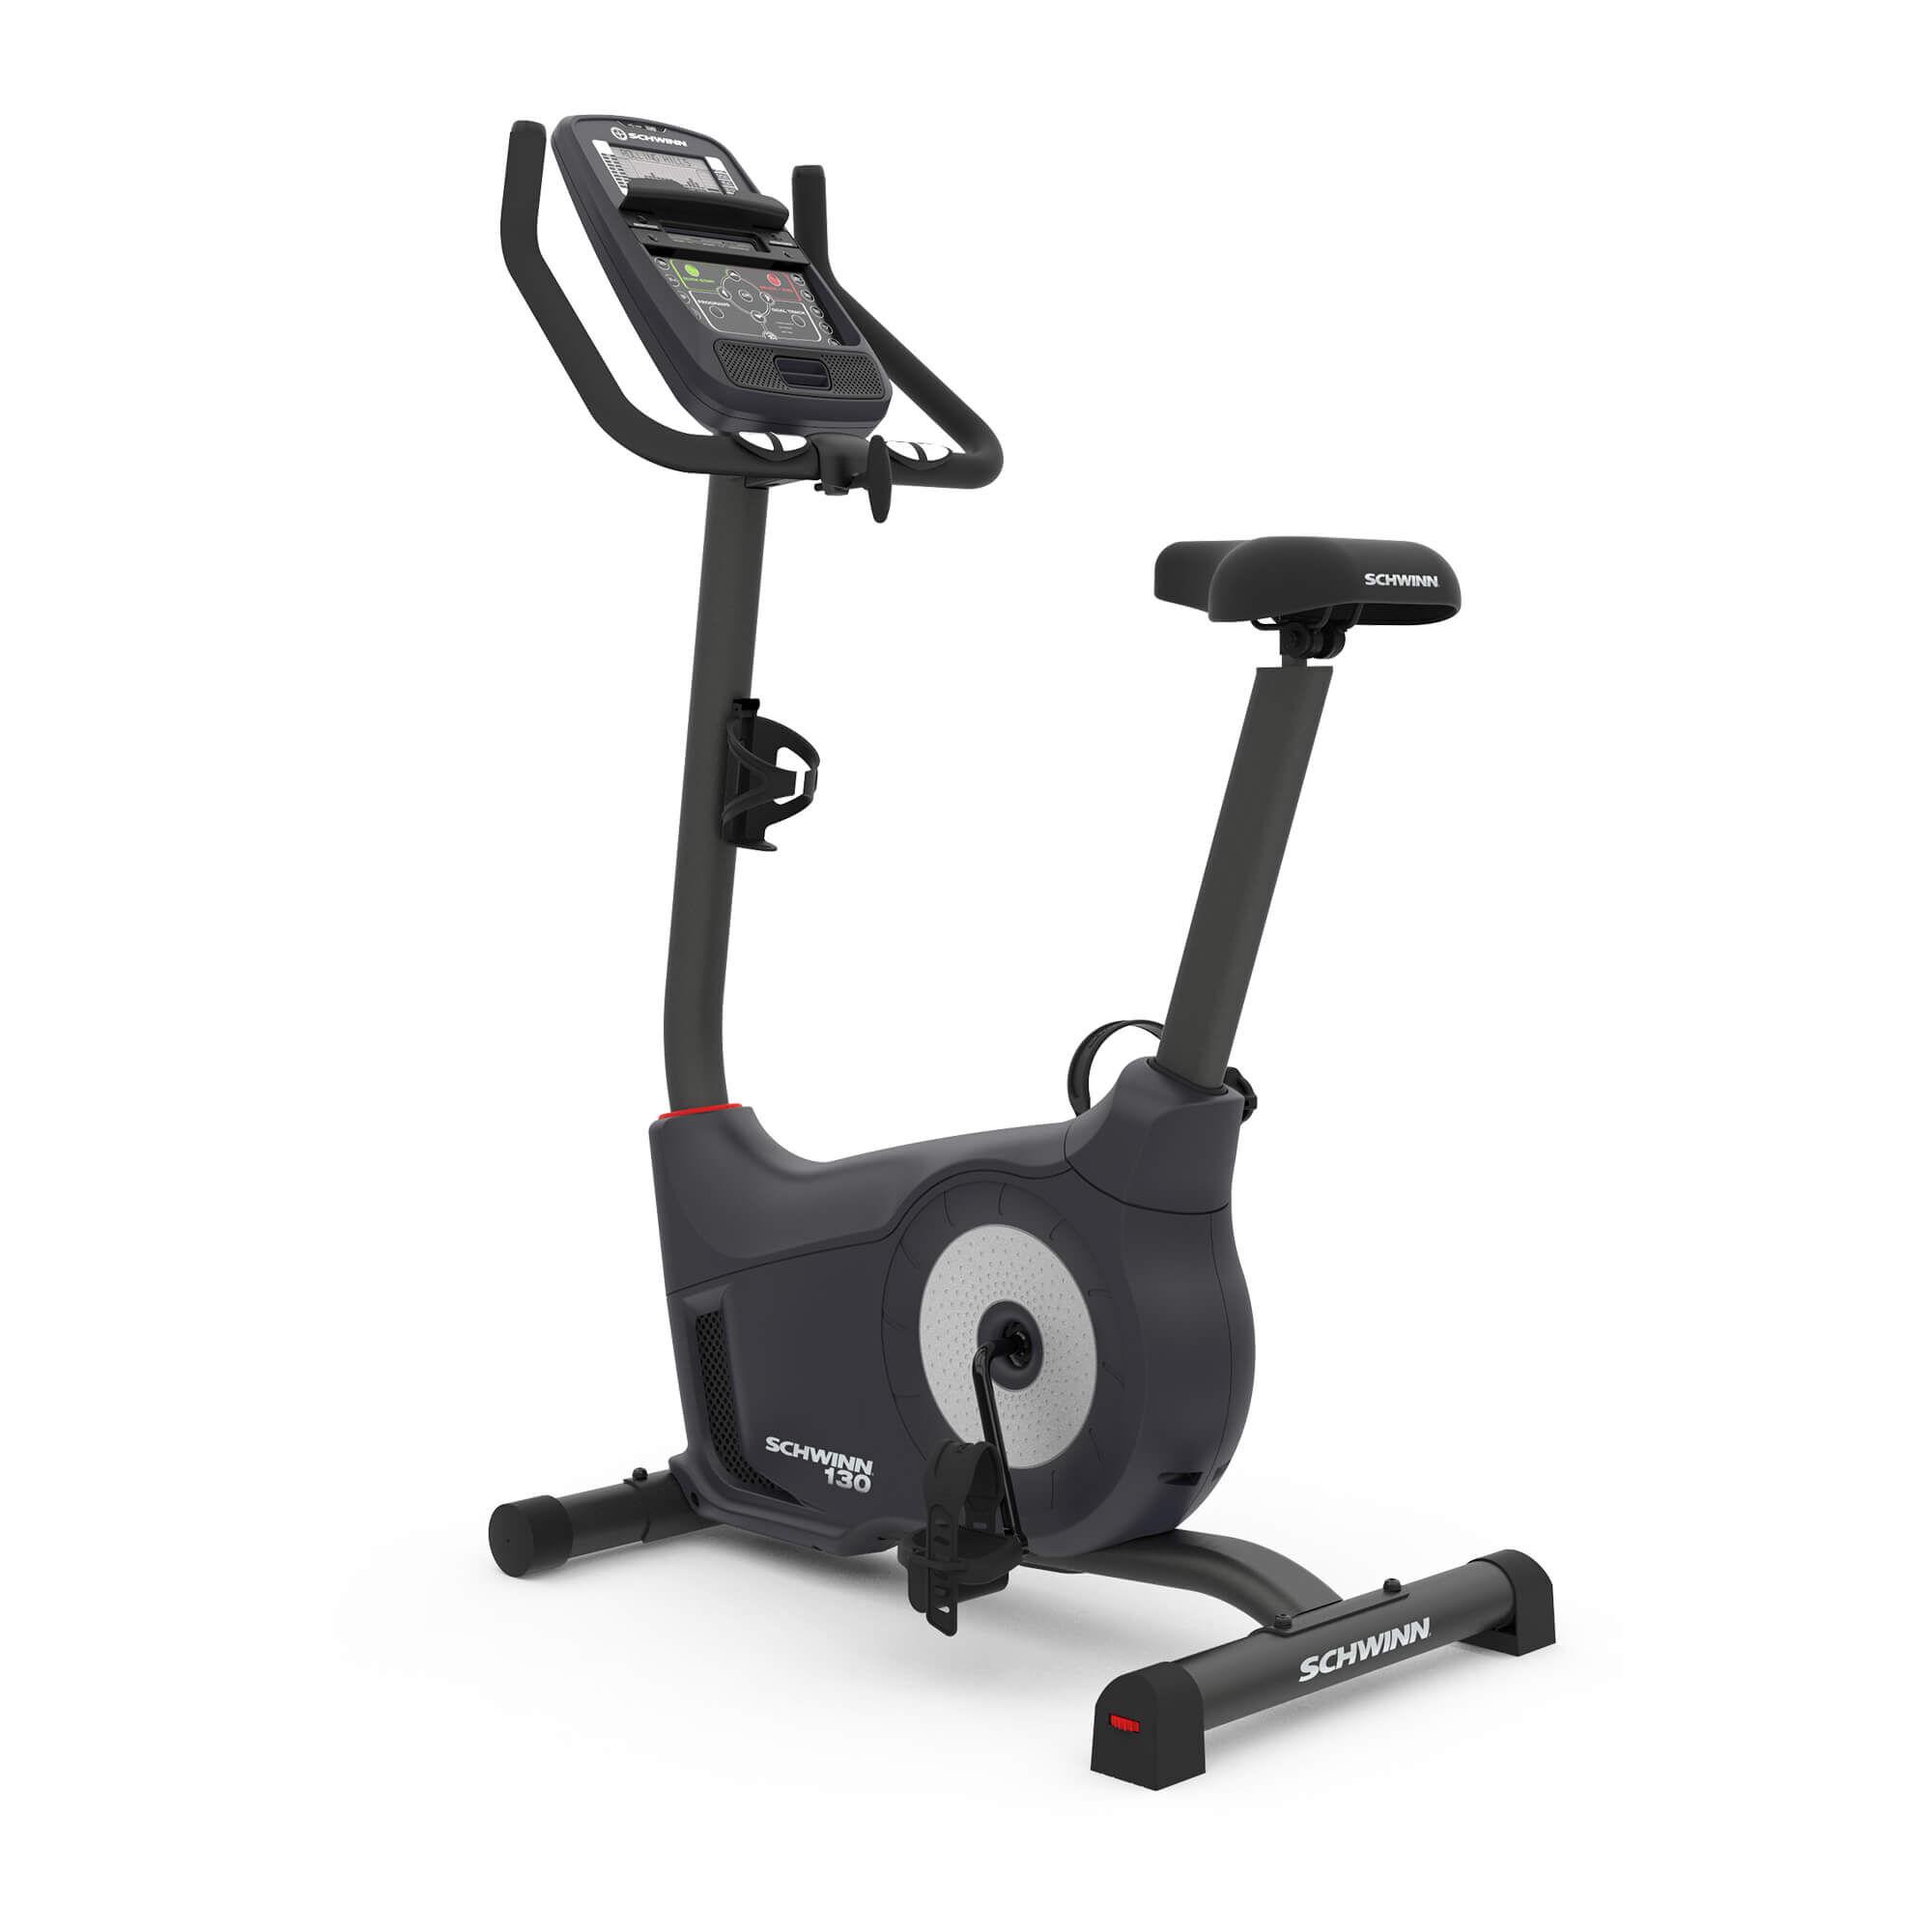 freewheel Shimano T0 E5Q1 New Bike rear cassette cog remover Cycle repair tool